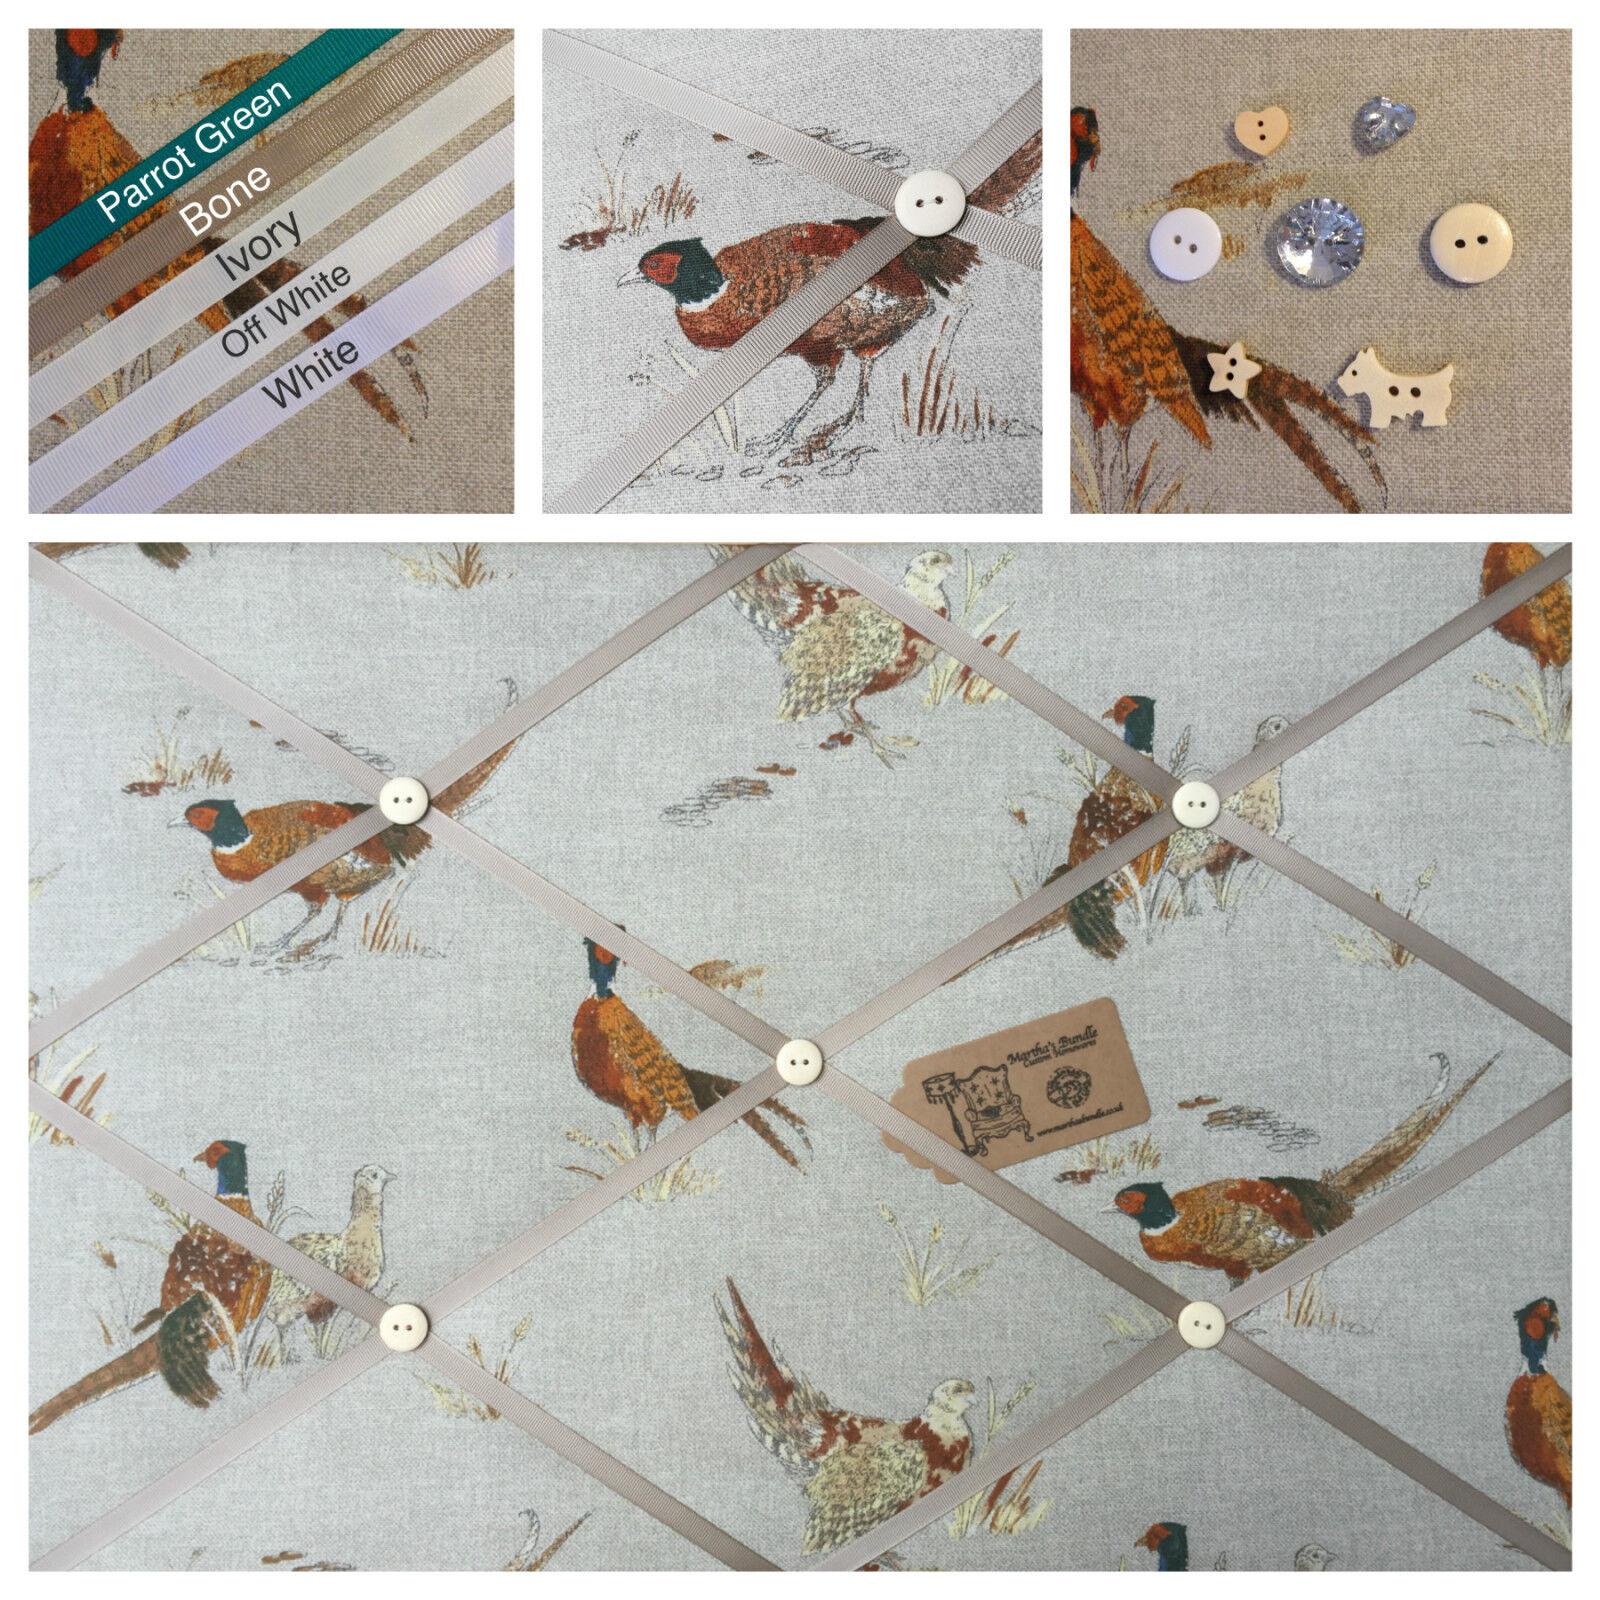 Custom hand made faisan Fryetts faisan made tissu pin/mémo/panneau d'affichage en liège sml lg xl daa8f9